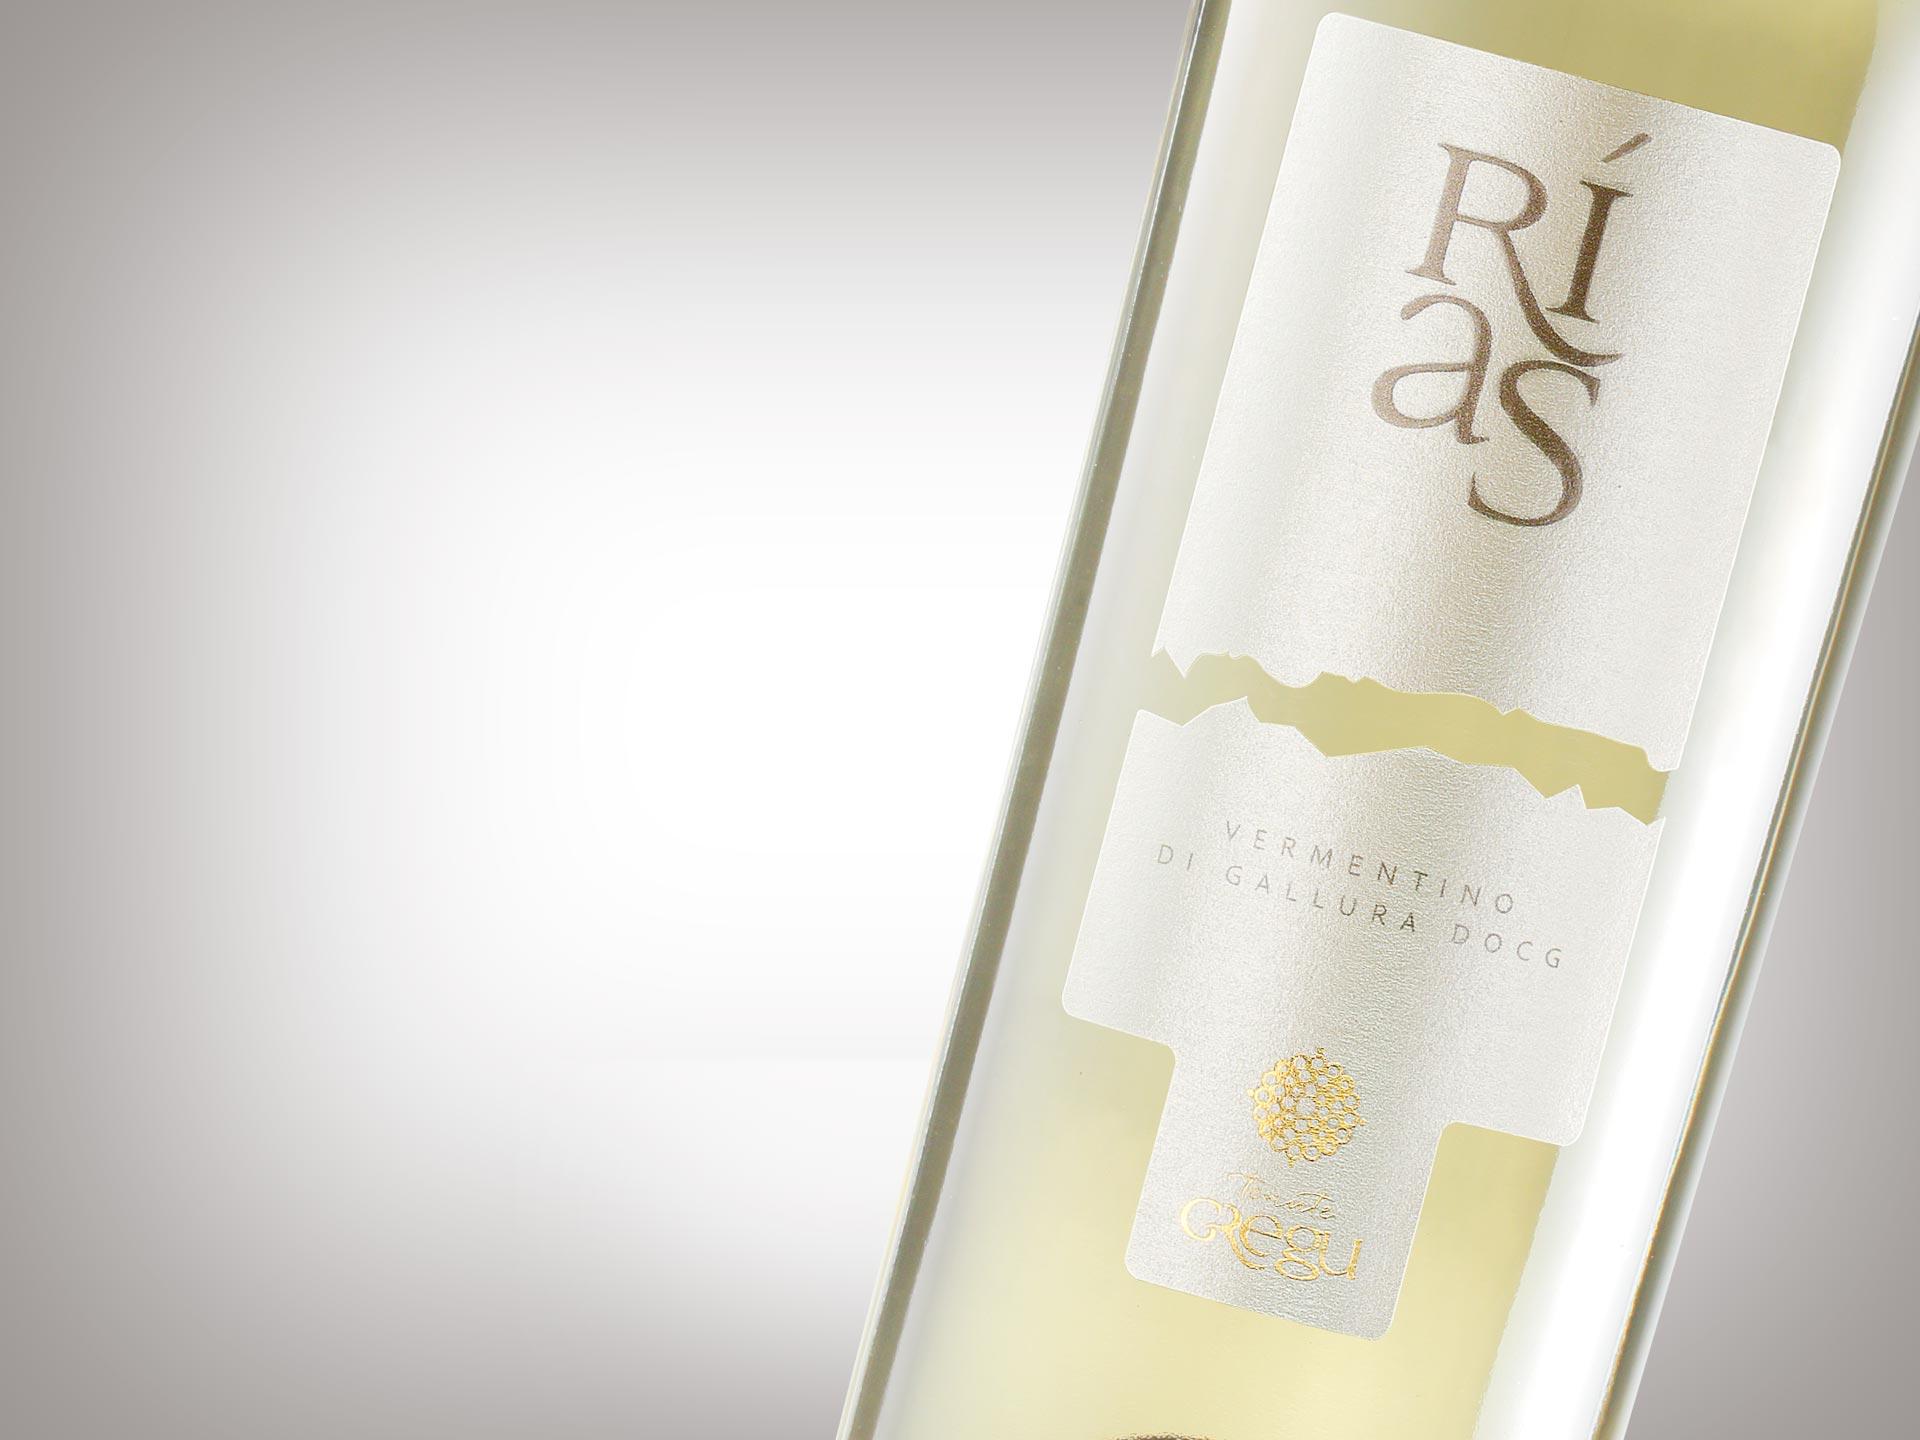 Etichetta vino Rias - Tenute Gregu